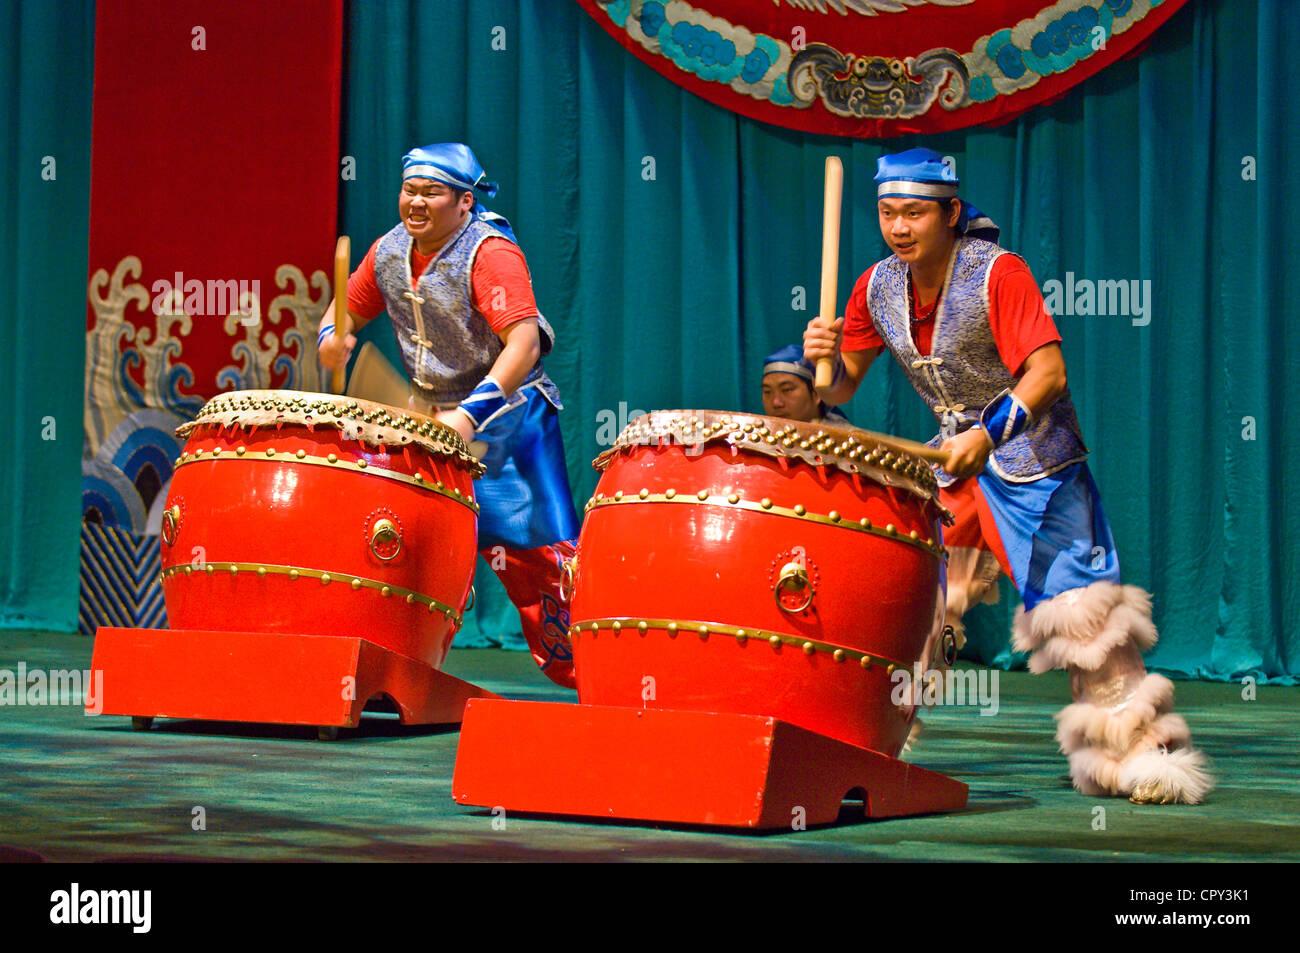 Taiwan, Taipei, Taiwan Cement Hall, Taipei Eye, drummers during a Chinese Opera show - Stock Image